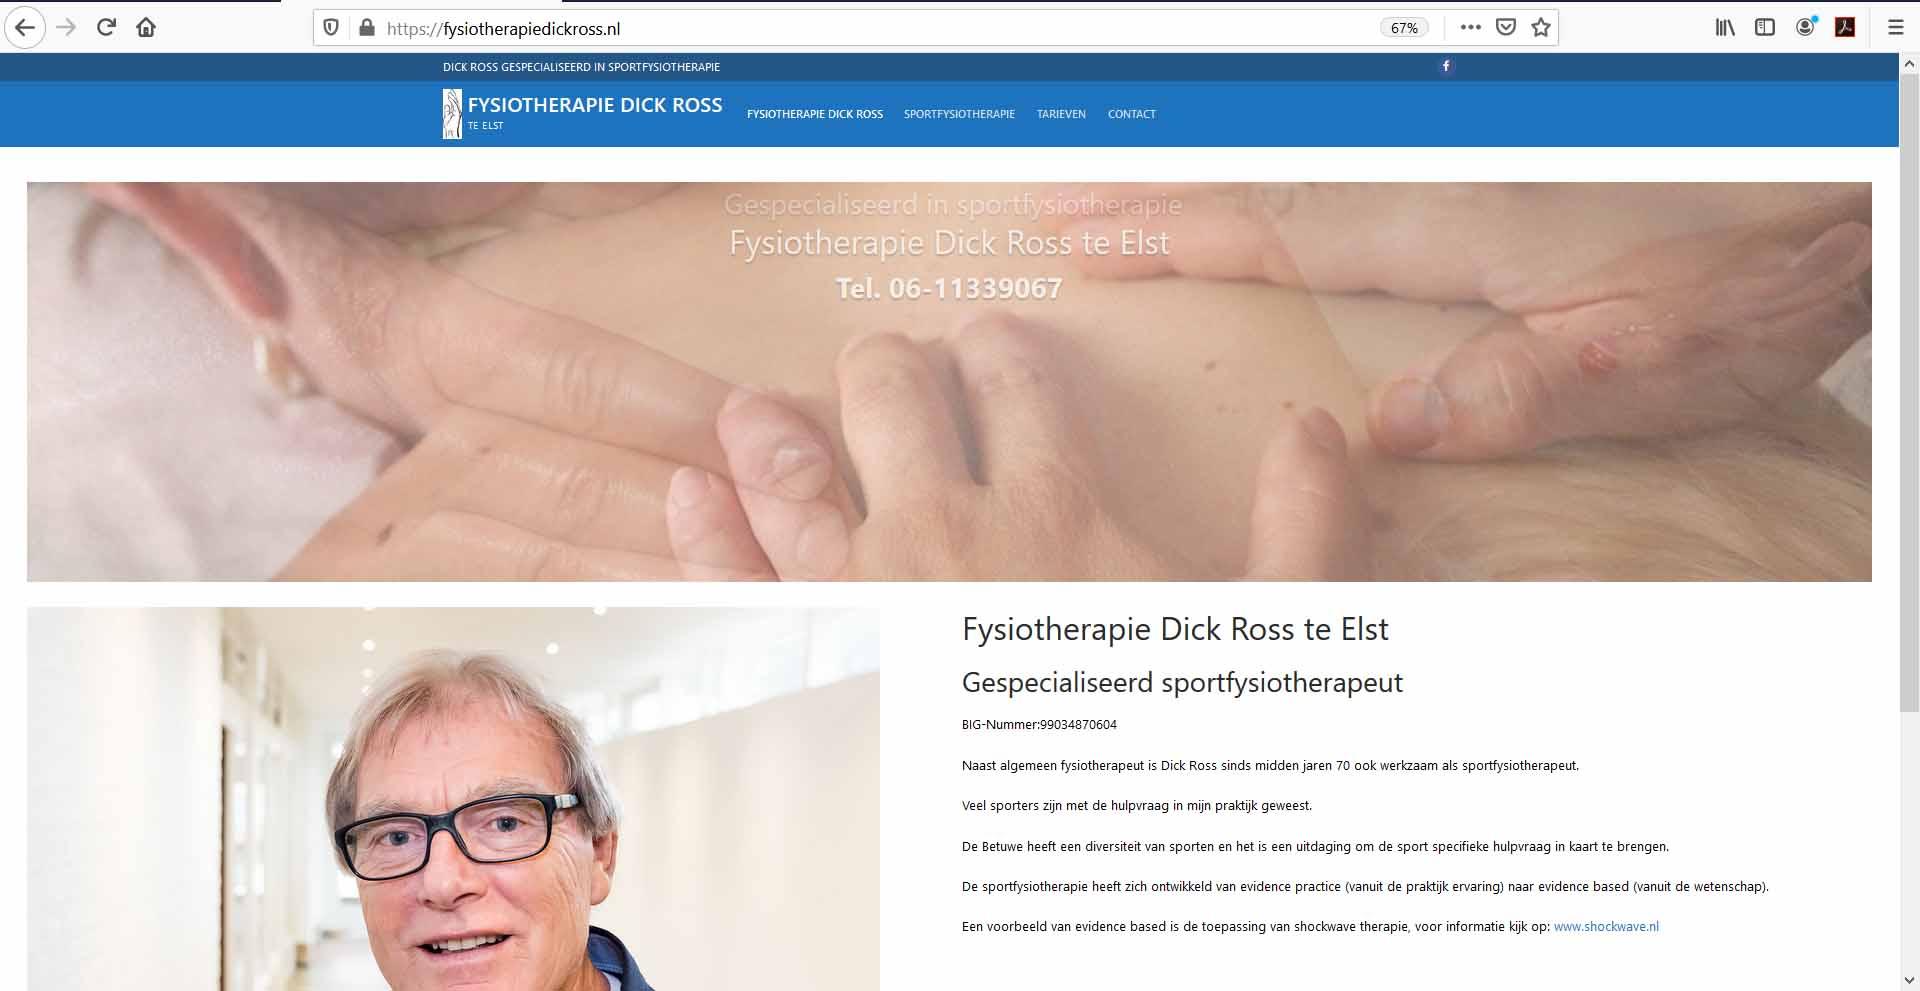 fysiotherapiedickross